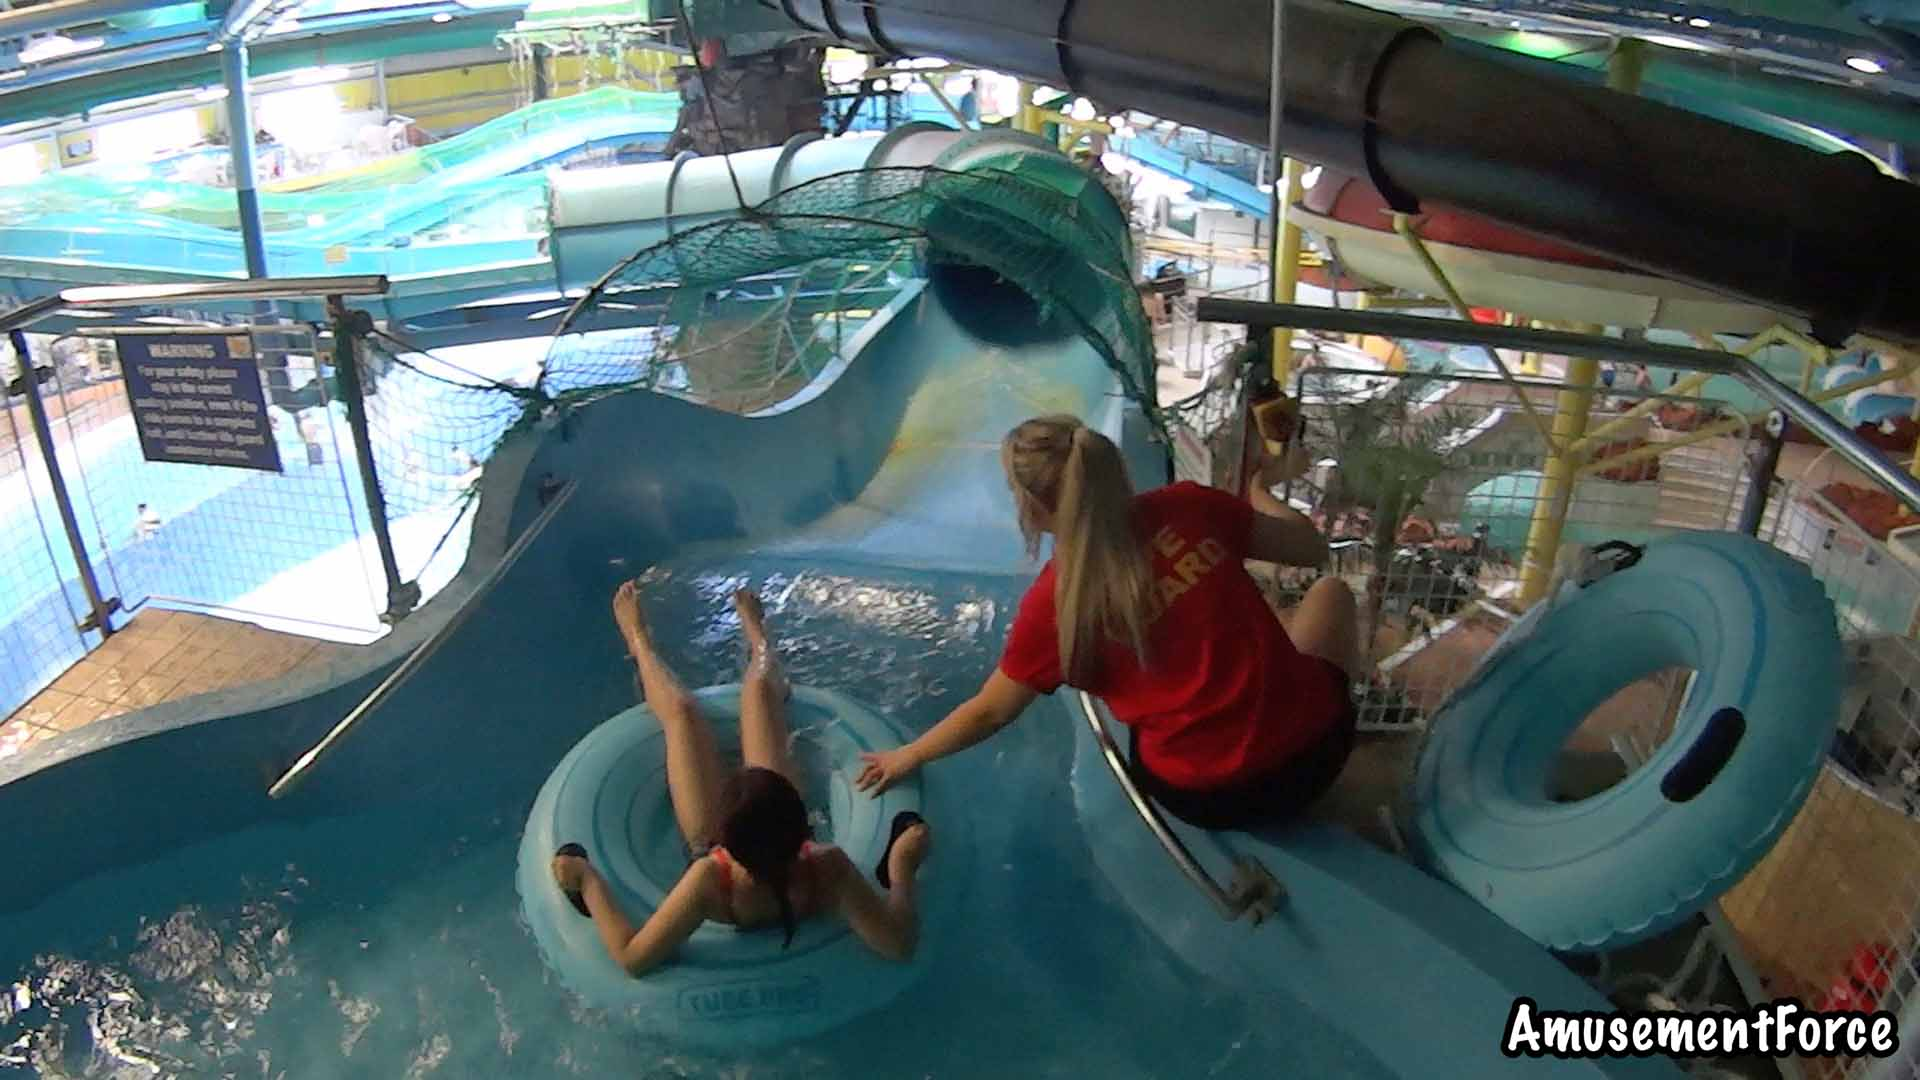 Waterworld Aqua Park Summer 2020 Review - Thrill Nation